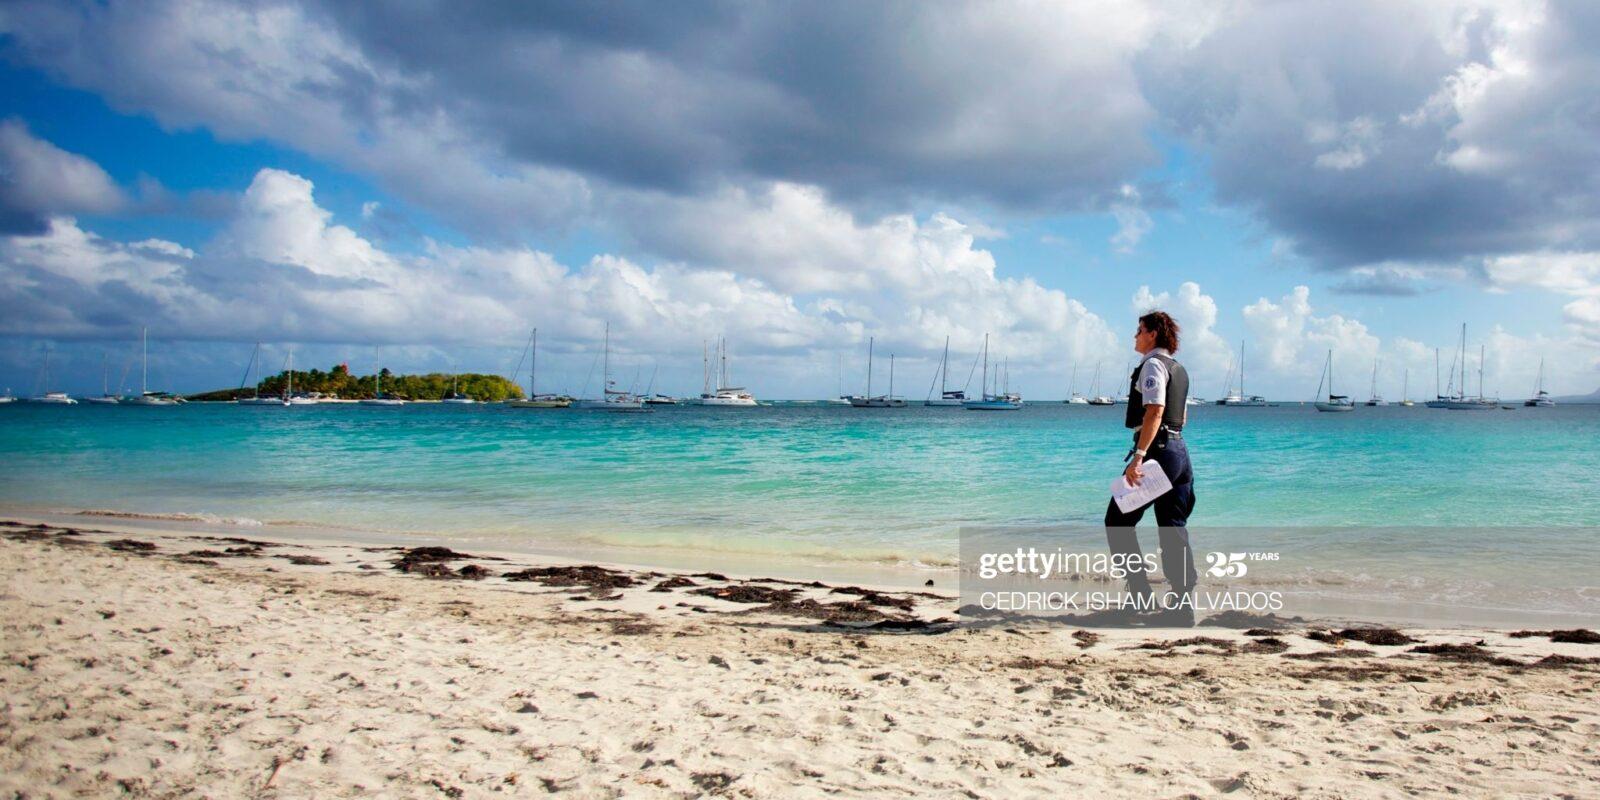 Caribbean Travel - COVID-19's Devastating Impact On Caribbean Tourism Revealed